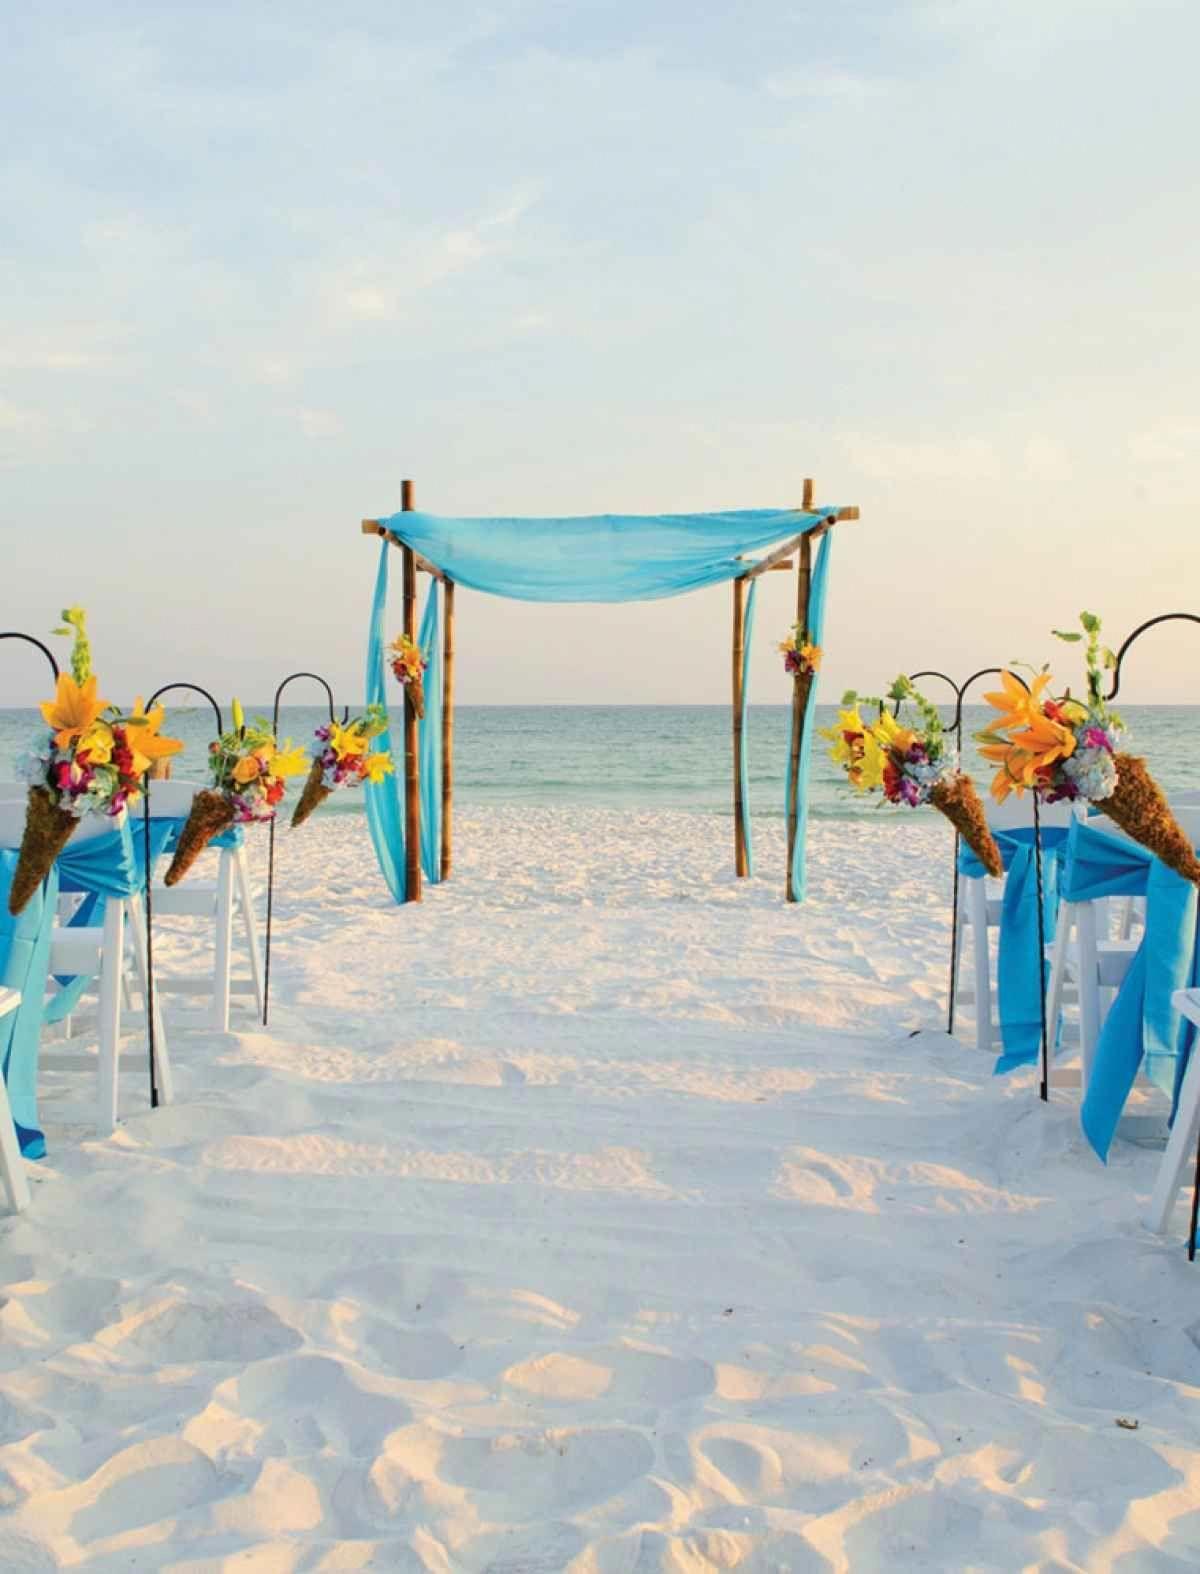 Best Florida Wedding Venues In 2020 Destin Florida Wedding Florida Wedding Venues Wedding Venues Beach